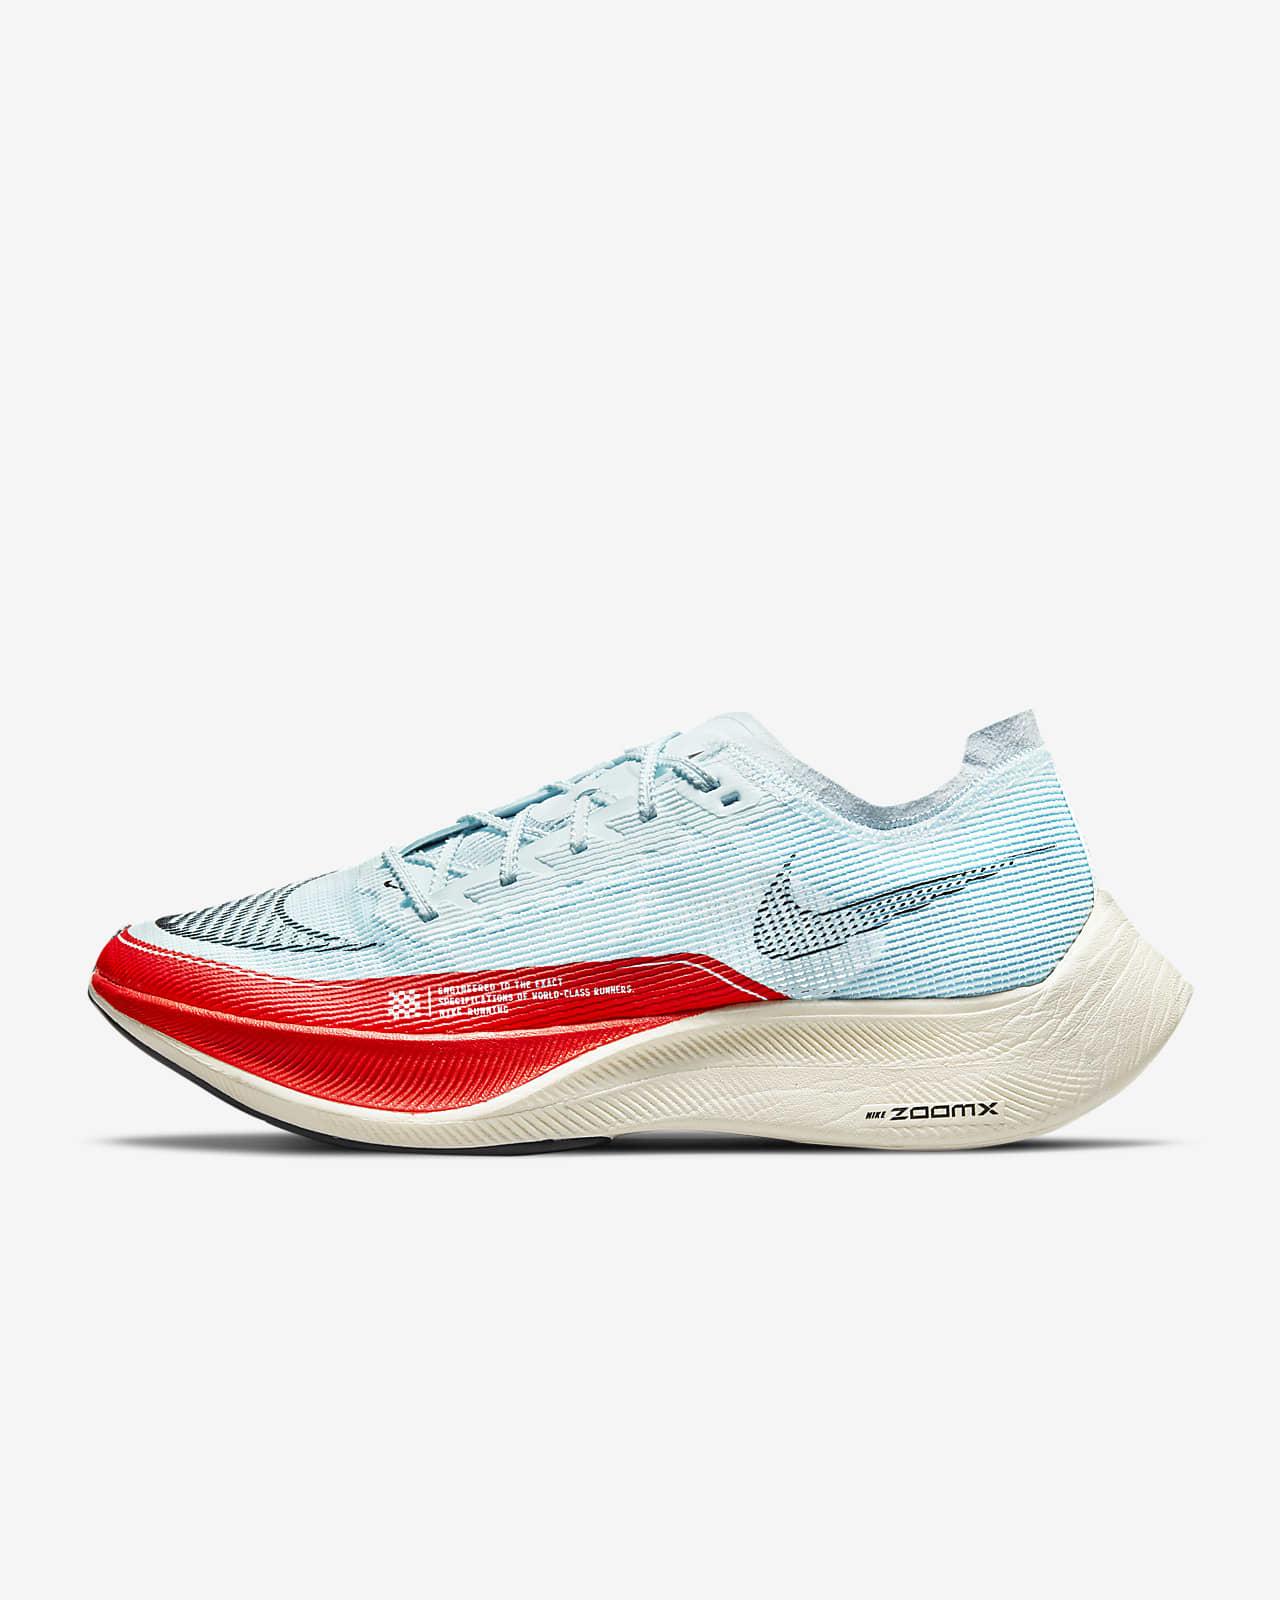 Chaussure de course Nike ZoomX Vaporfly Next%2 «OG» pour Homme